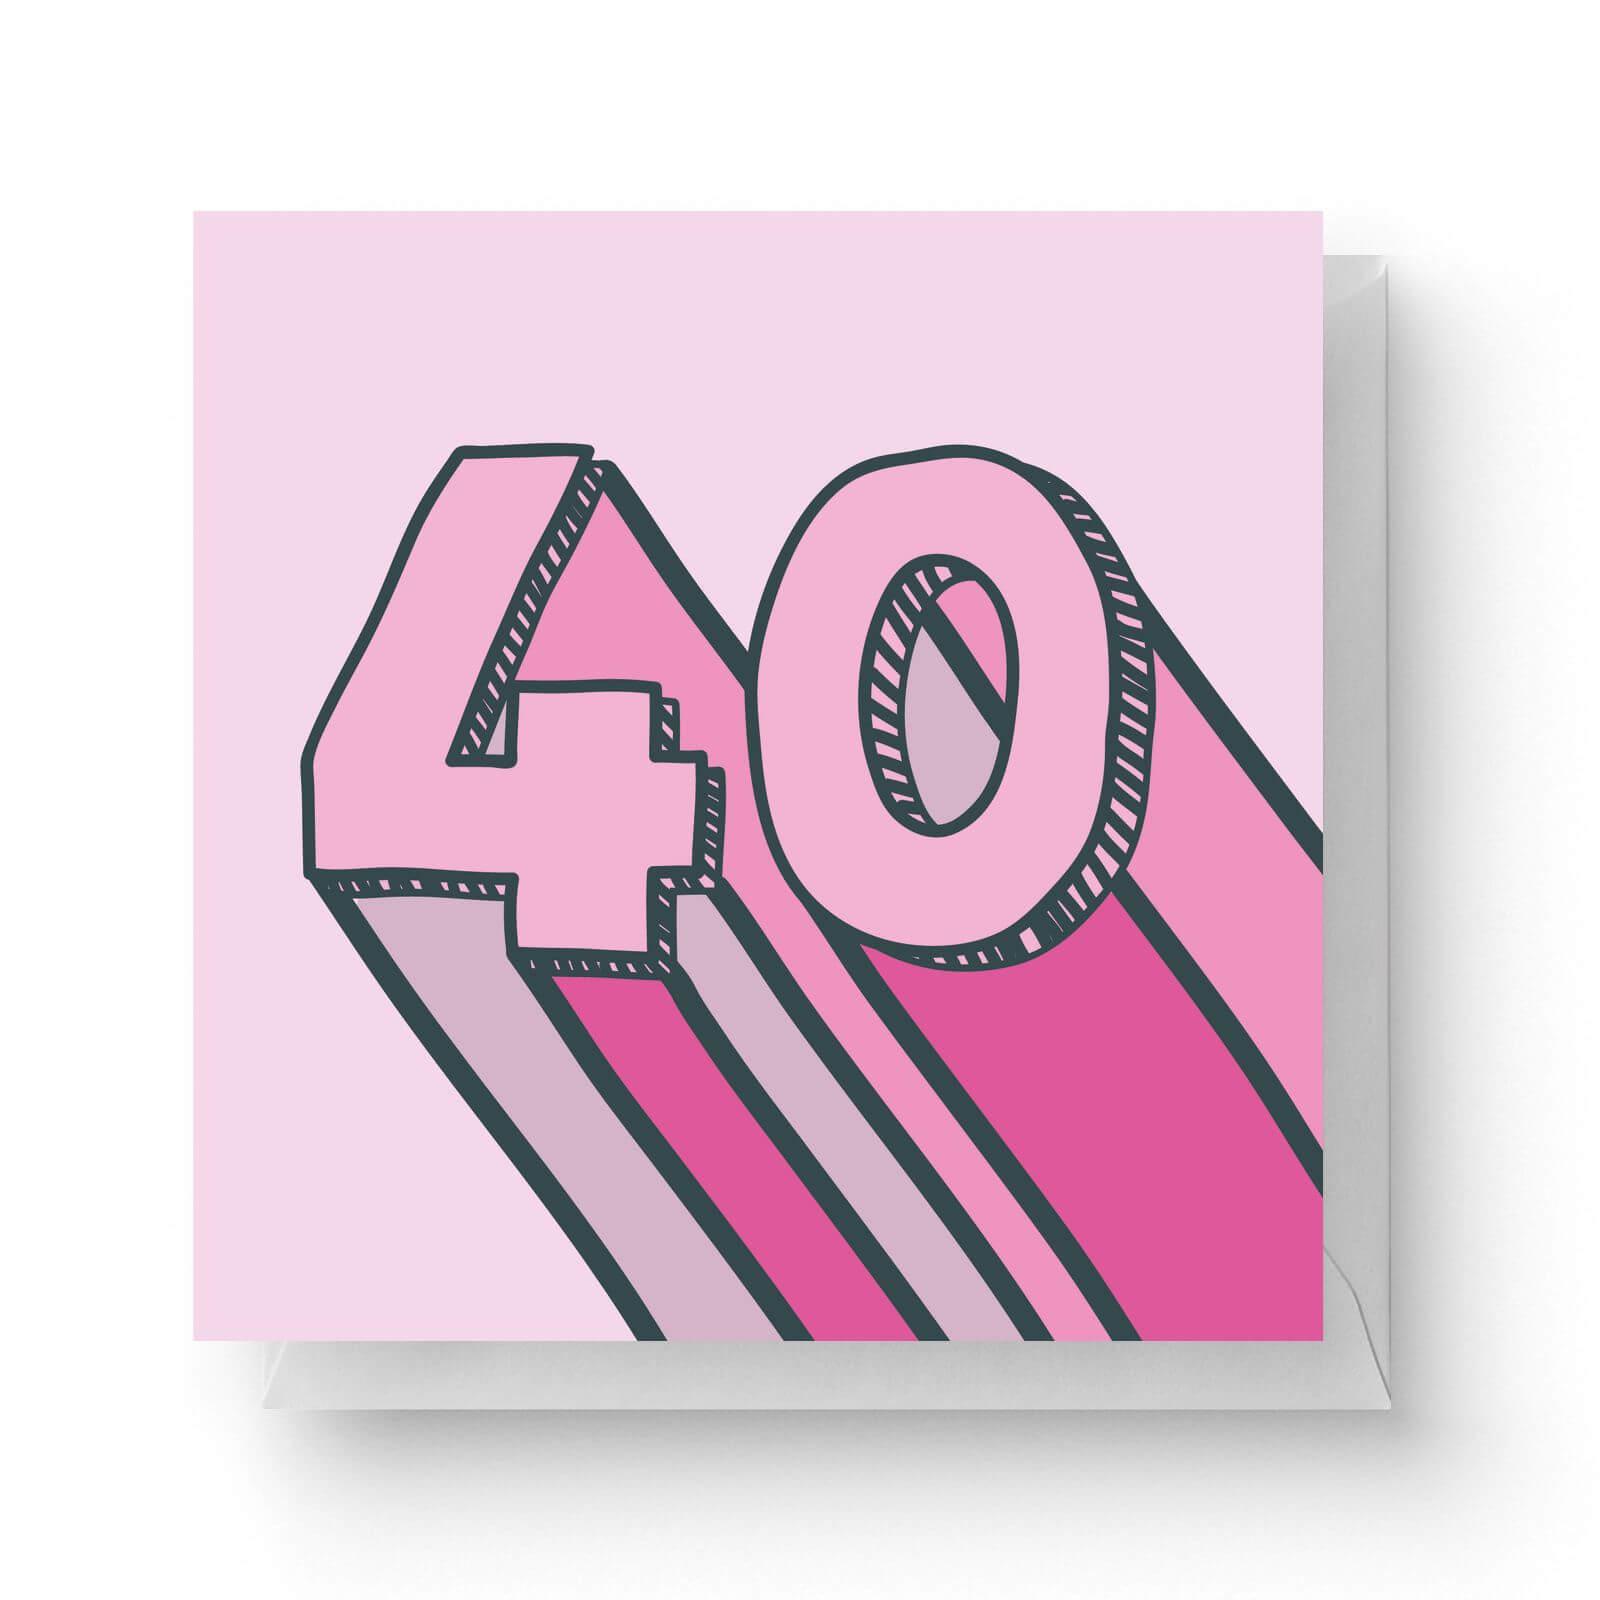 Image of 40 Square Greetings Card (14.8cm x 14.8cm)